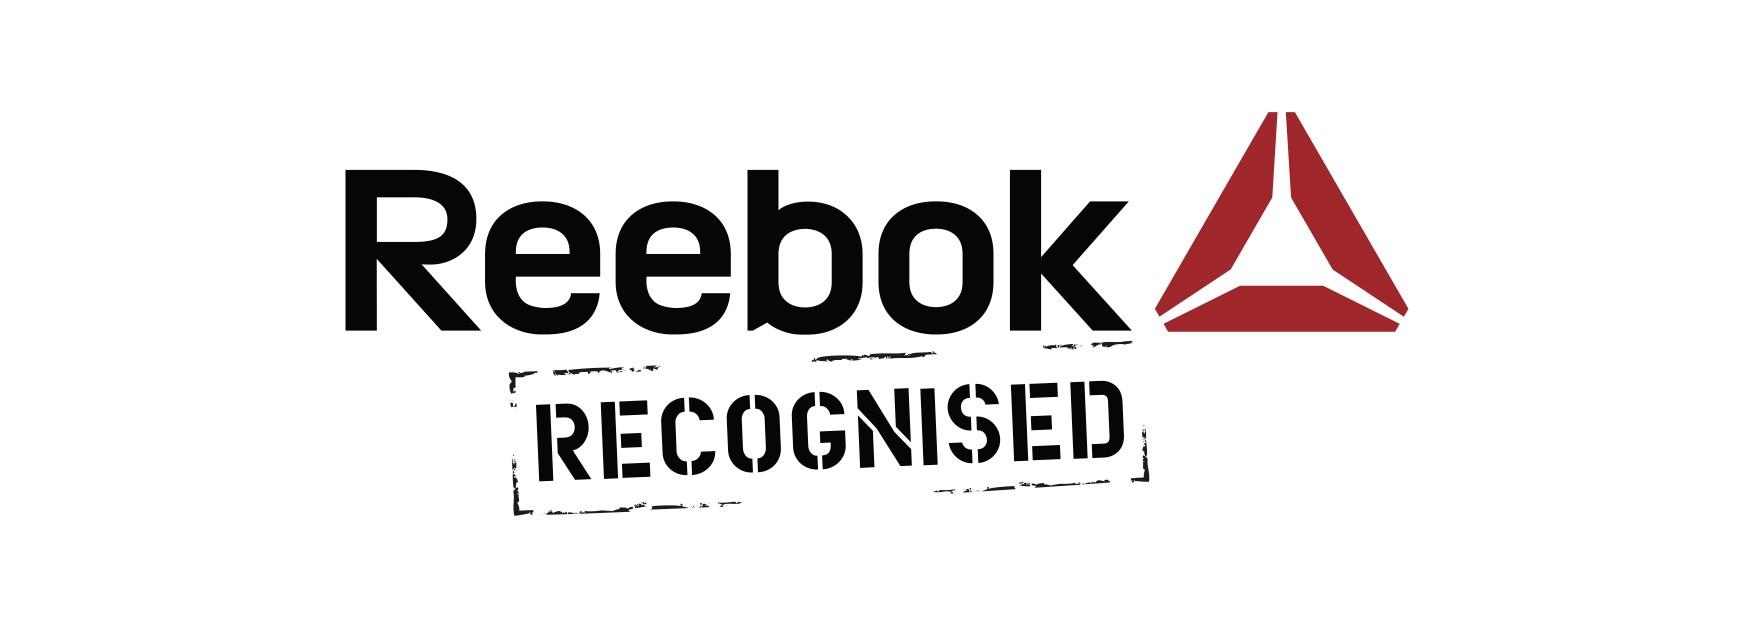 Reebok-Recognised-logo-Blk_Whit